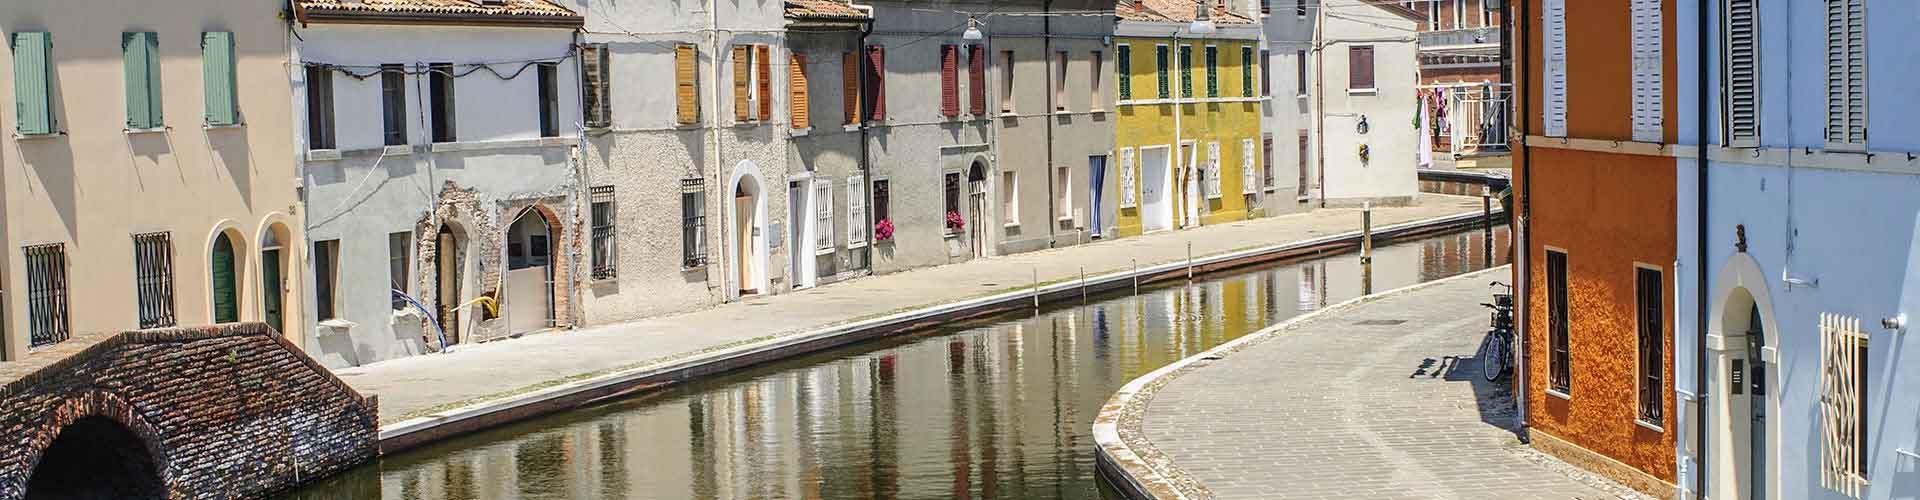 Ferrara - Apartamentos en Ferrara. Mapas de Ferrara, Fotos y comentarios de cada Apartamento en Ferrara.